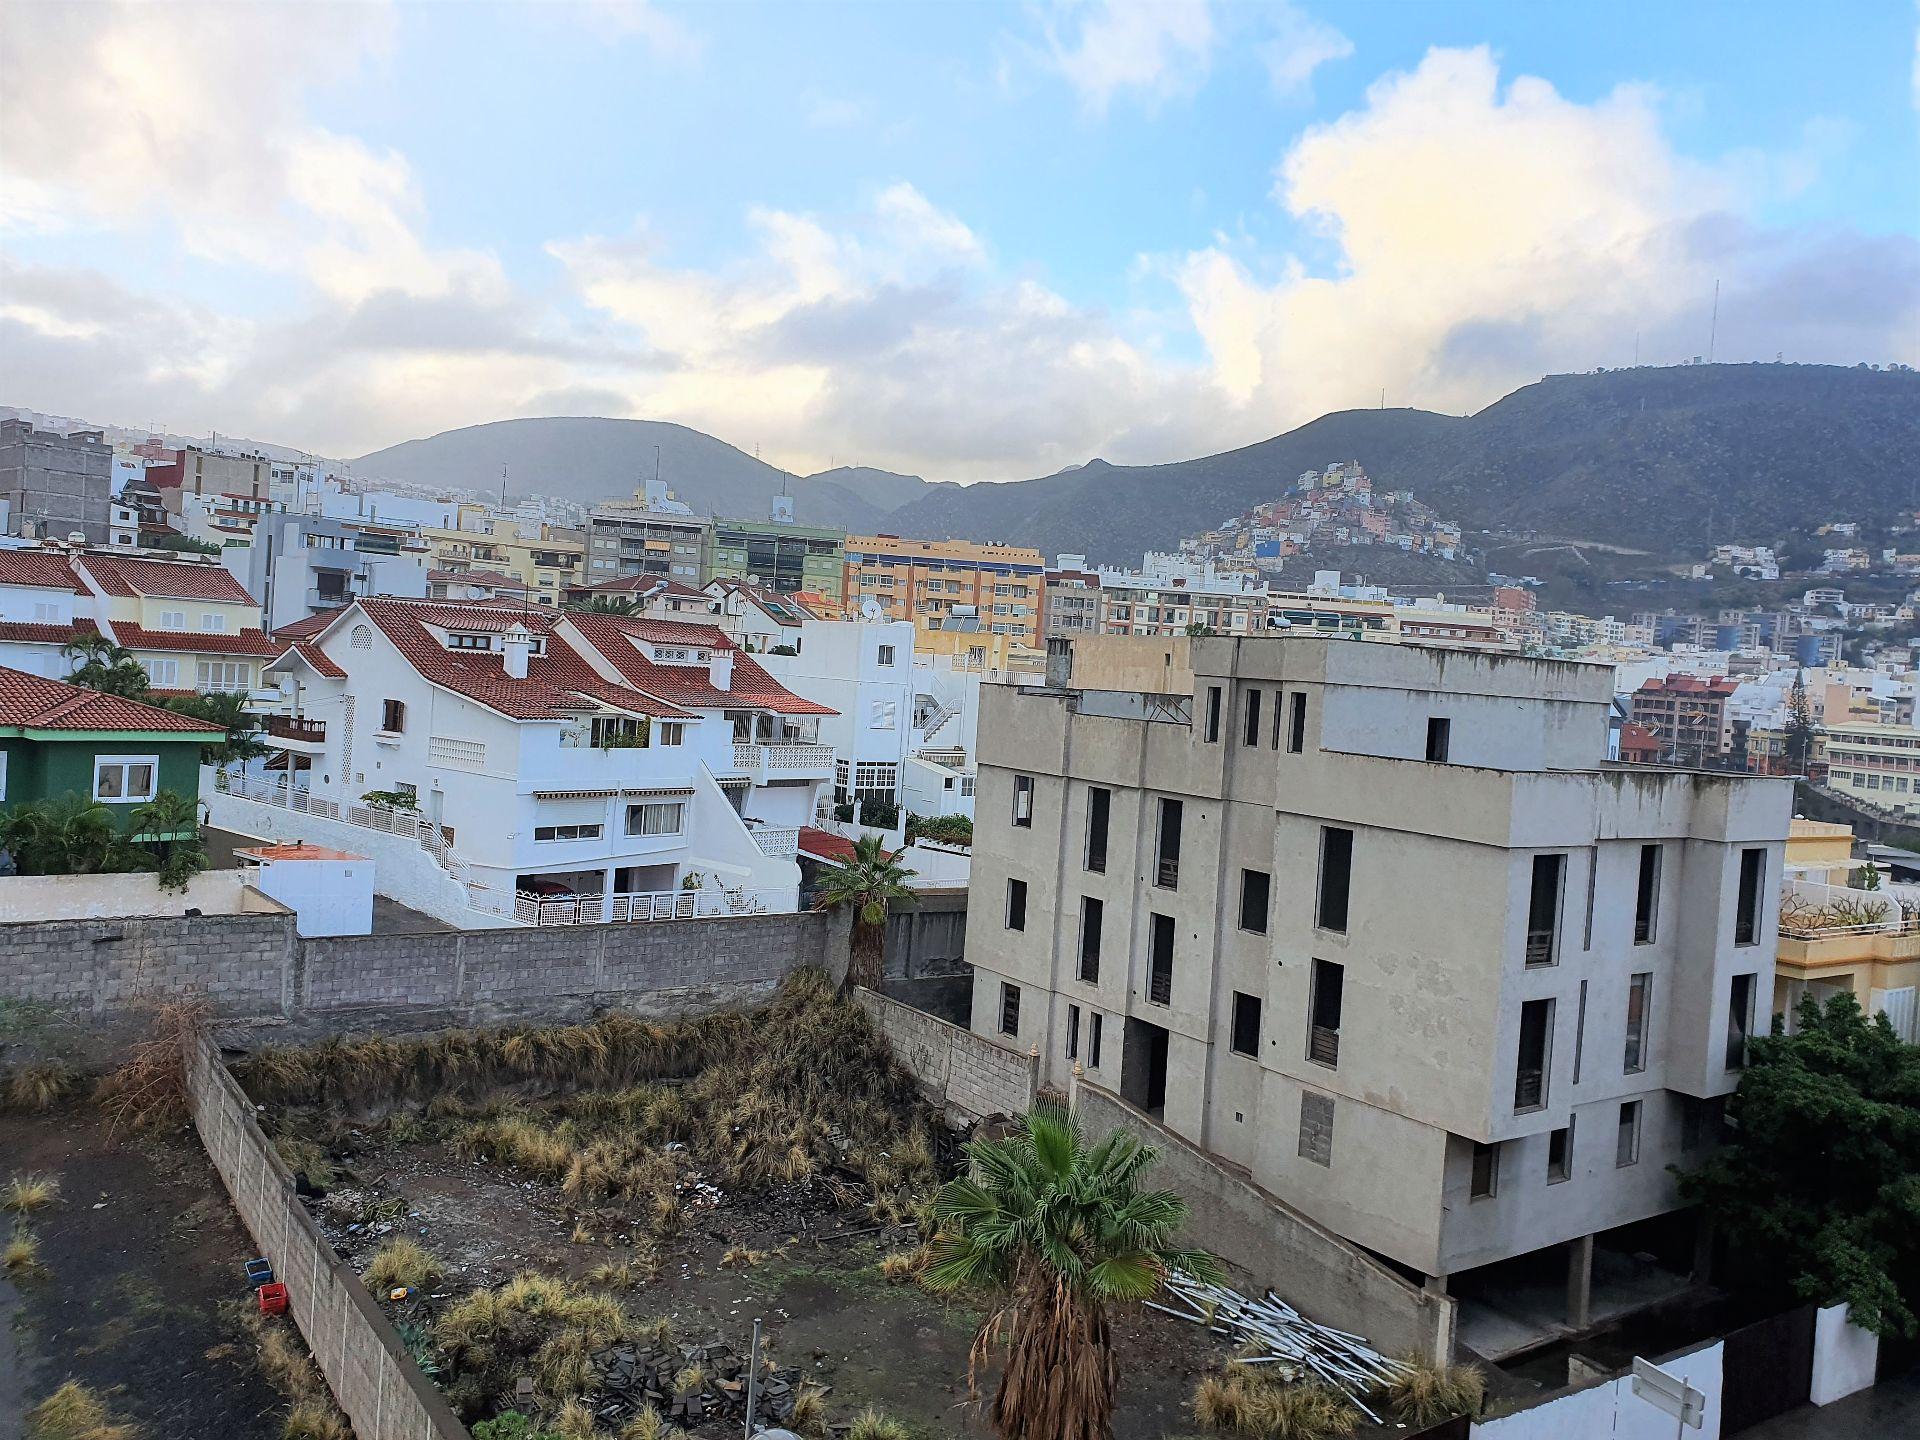 Piso en Santa Cruz de Tenerife, AVENIDA BÉLGICA, venta